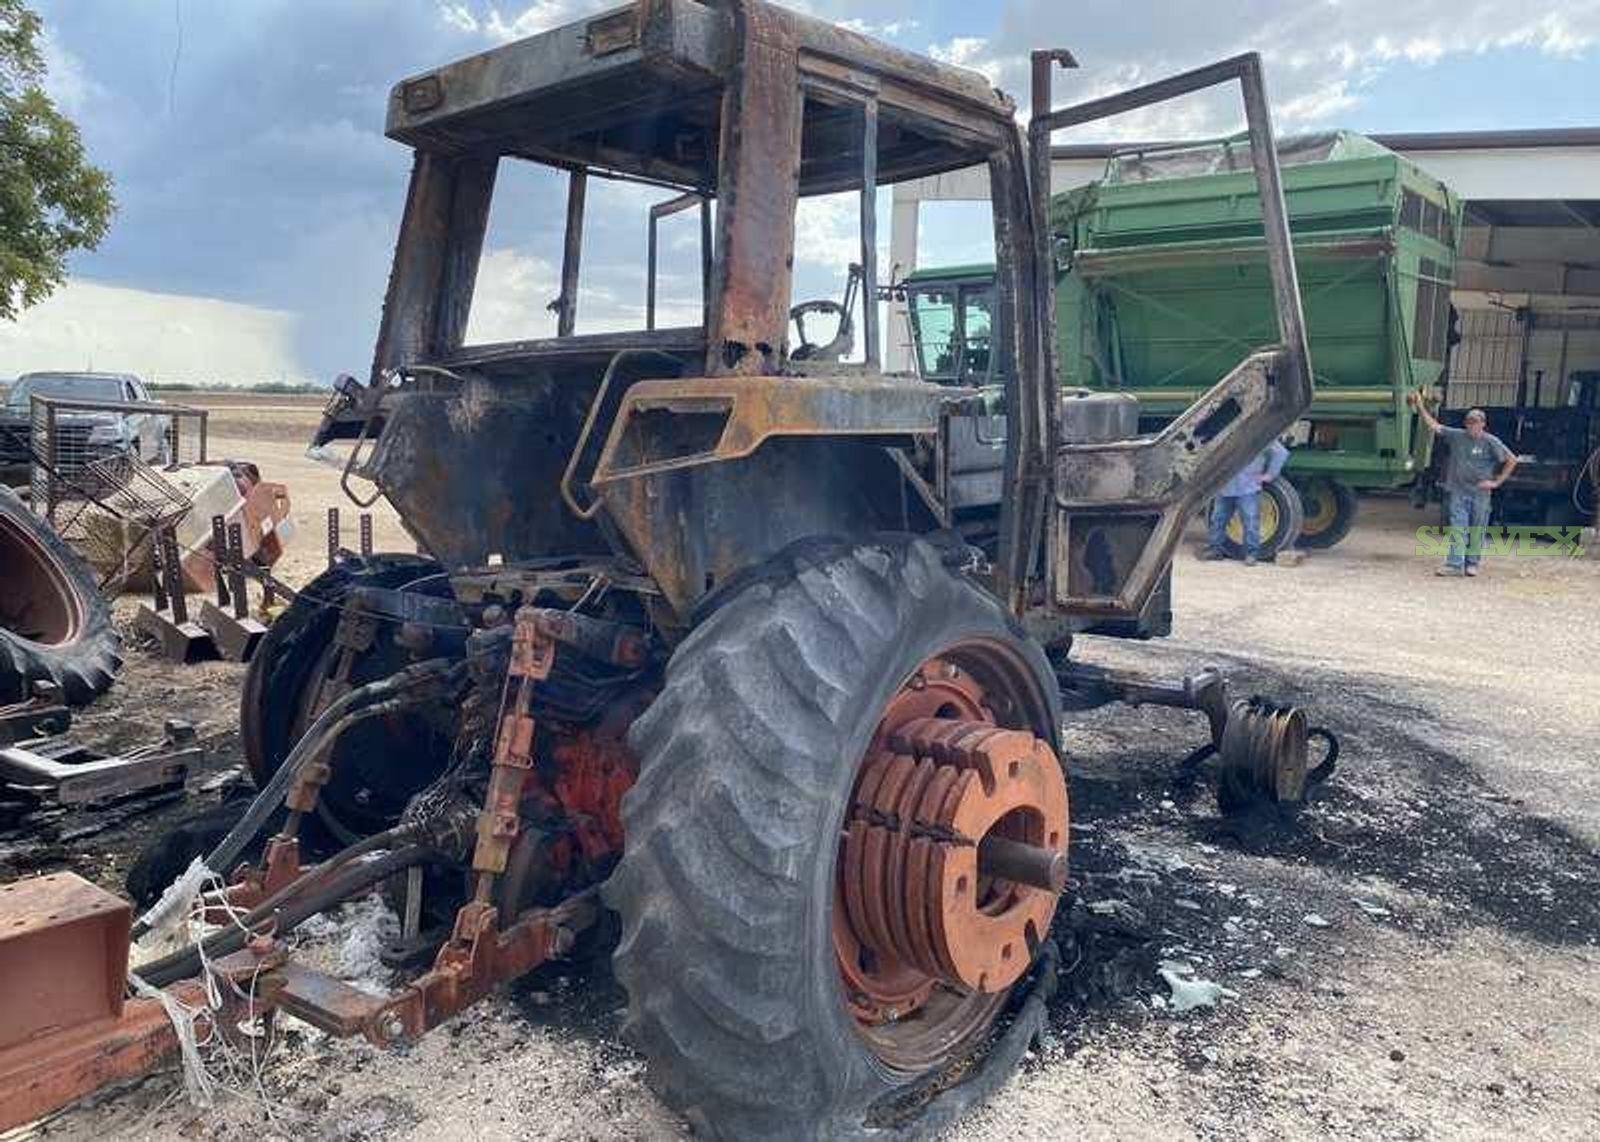 International 1086 Tractor 1976 - Damaged (1 Unit)